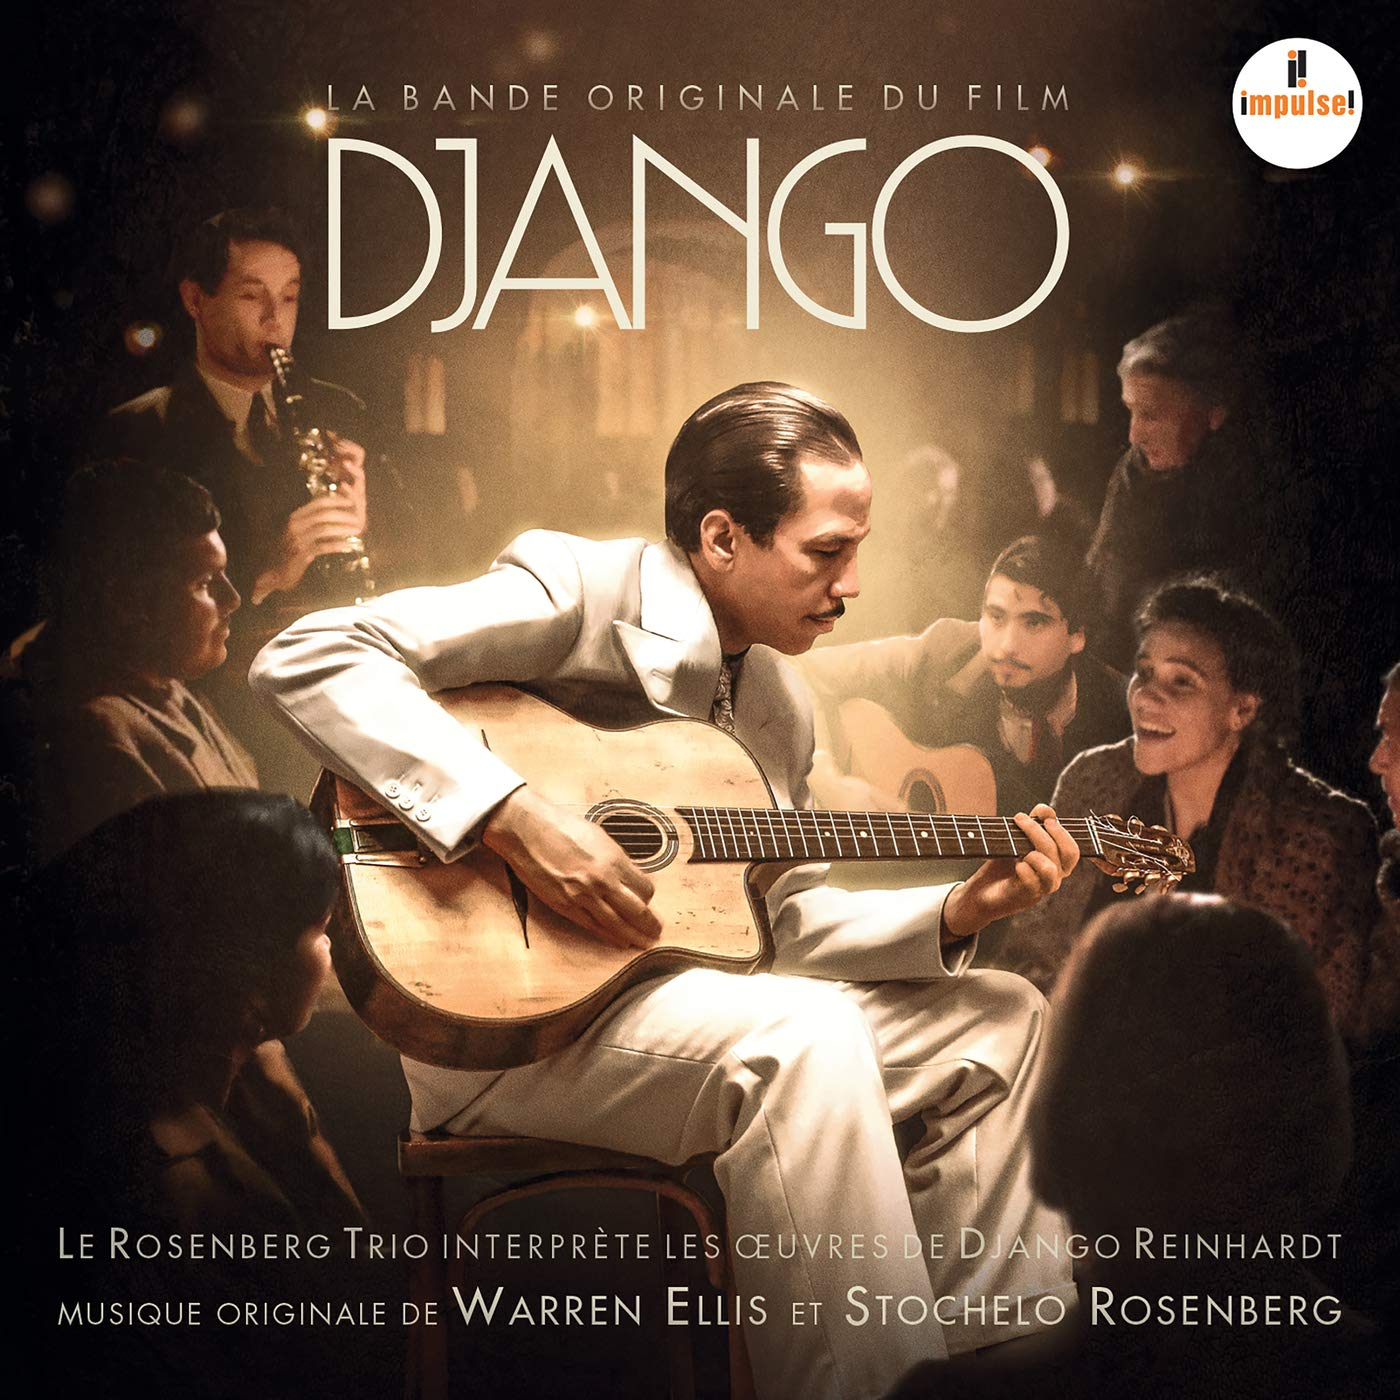 Django (Original Soundtrack) by Impulse Records